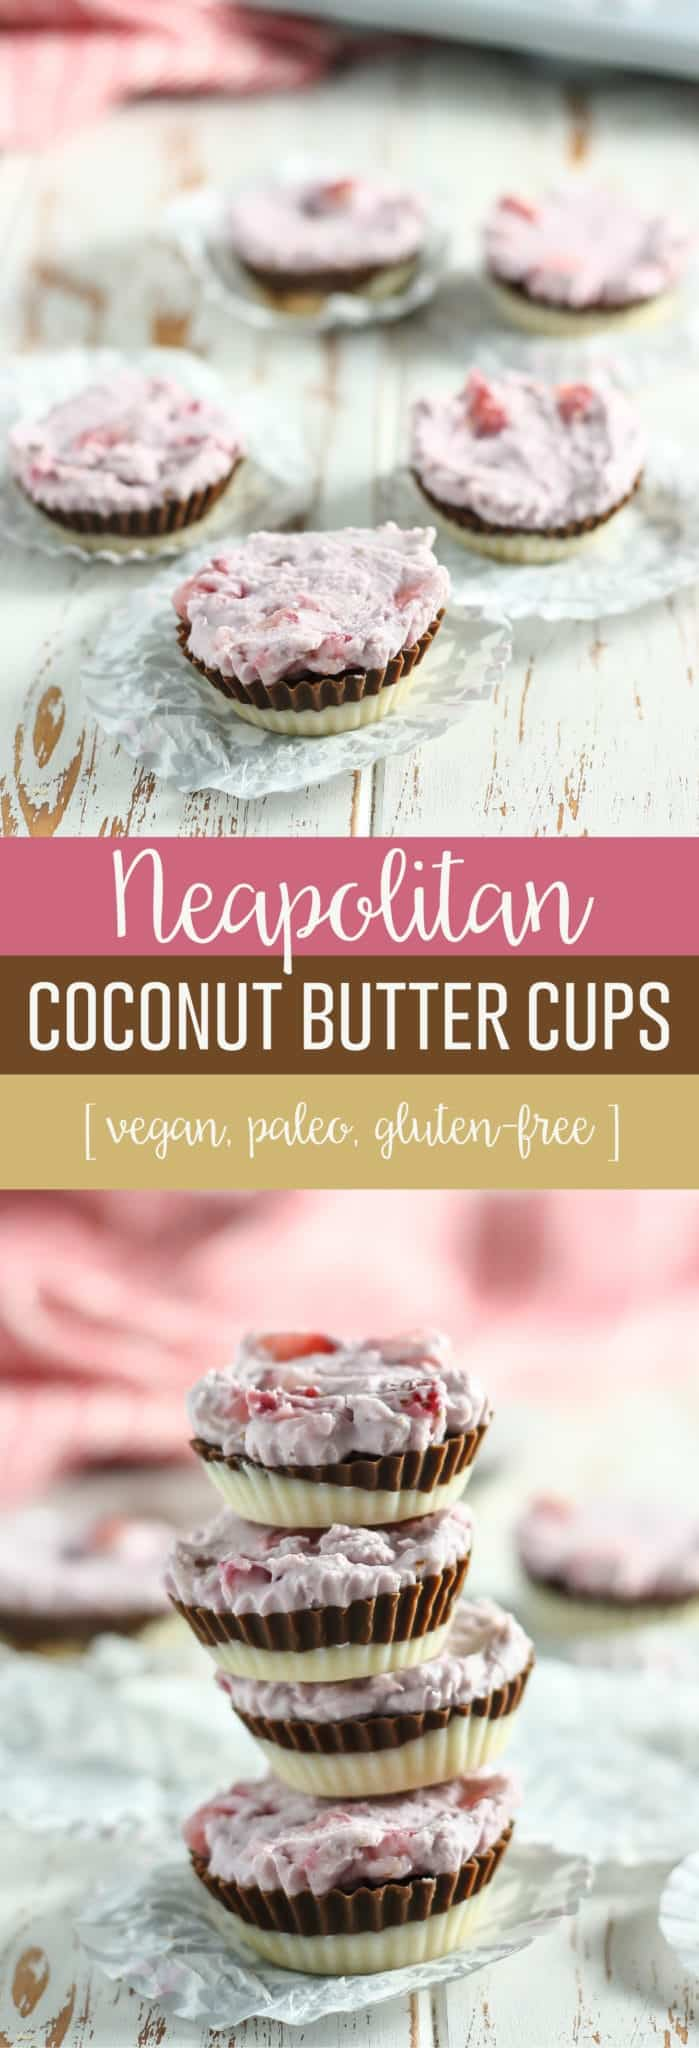 Neapolitan Coconut Butter Cups